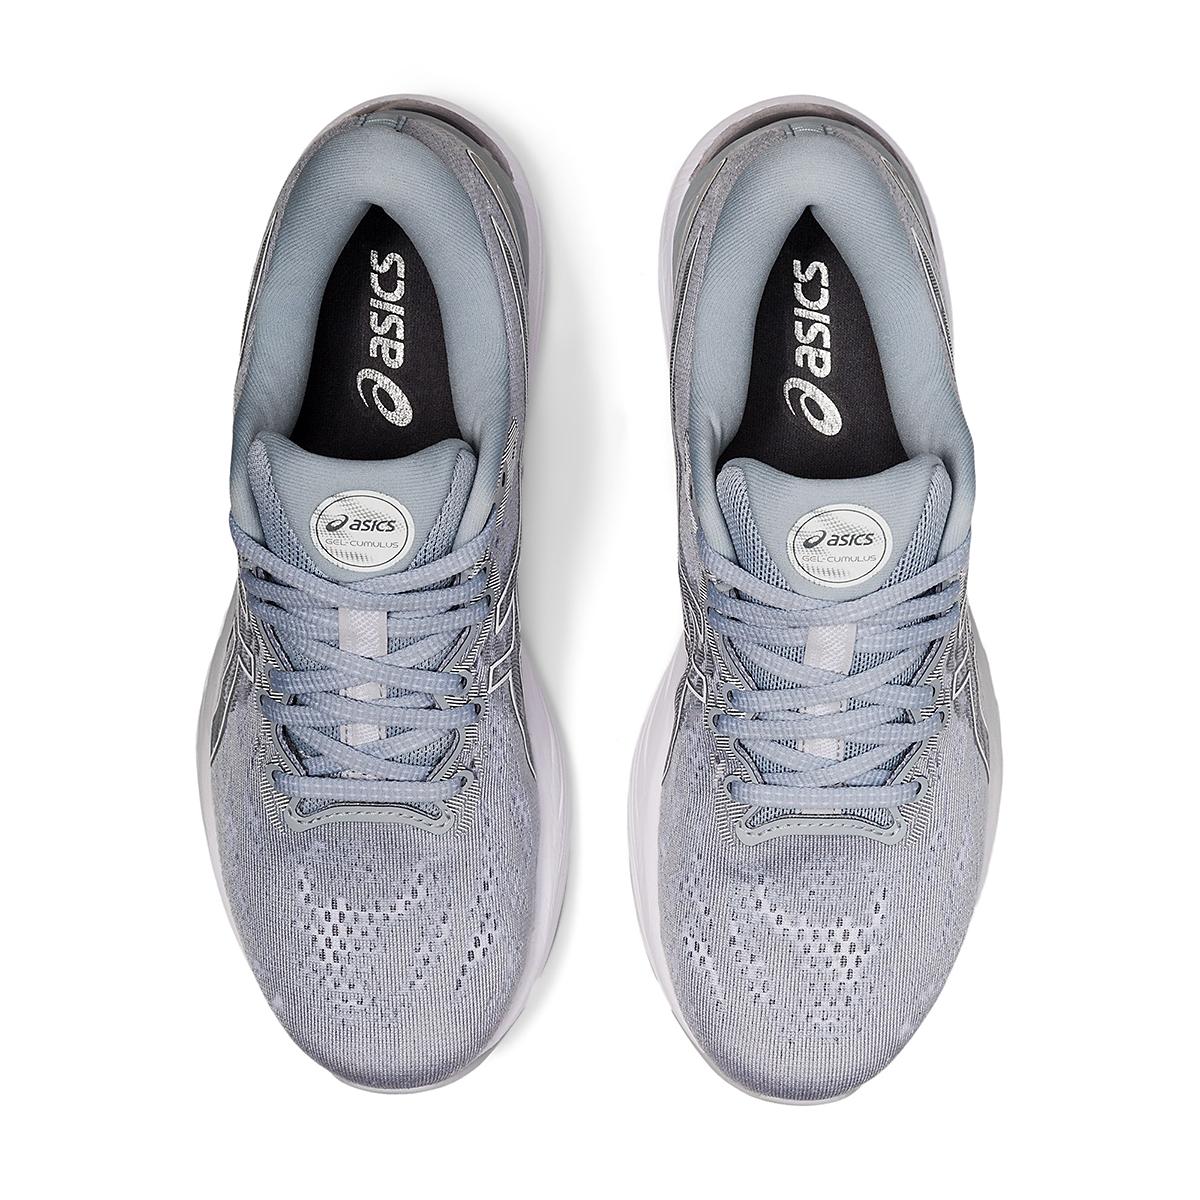 Women's Asics Gel-Cumulus 23 Running Shoe - Color: Piedmont Grey/White - Size: 5 - Width: Regular, Piedmont Grey/White, large, image 3